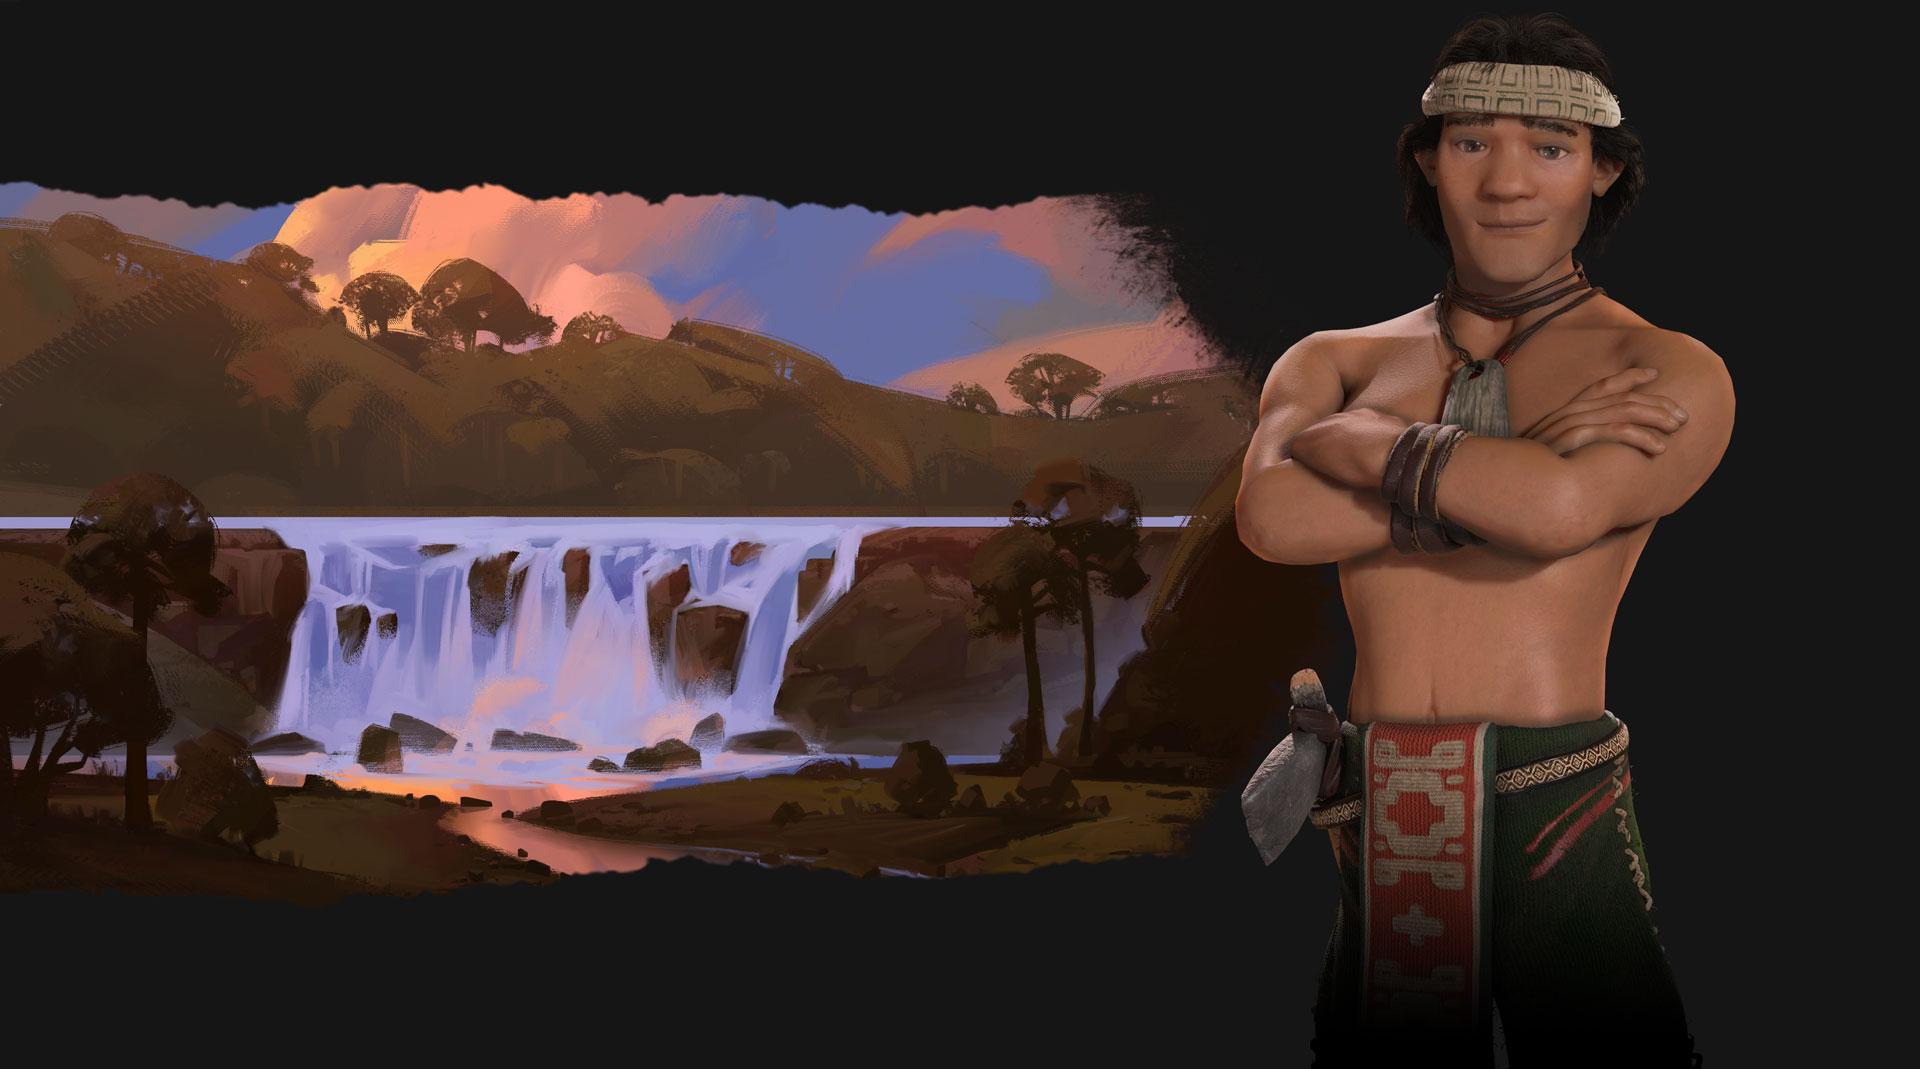 2KGMKT_CivilizationVI-RF_Game-Art_Mapuche_Lautaro_Bkgrnd.jpg